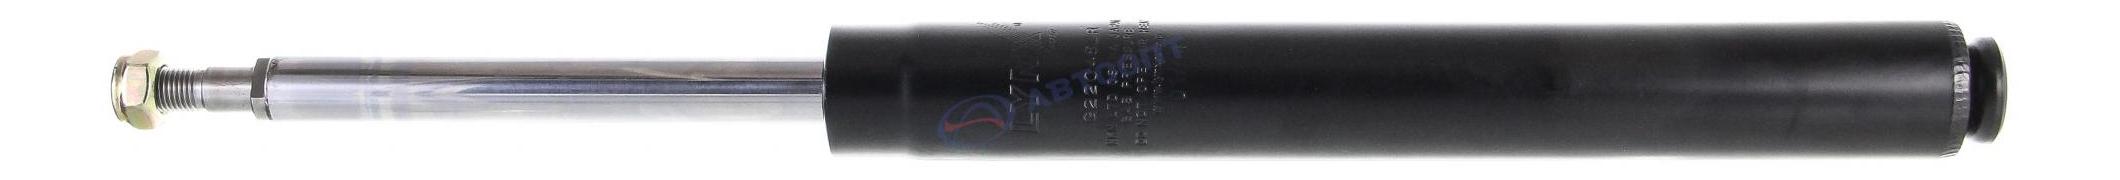 "Картридж стойки T.Camry,Vista #V2#,#V3#,#V4# Front R=L G22048LR ""Lynx"" (Япония)"